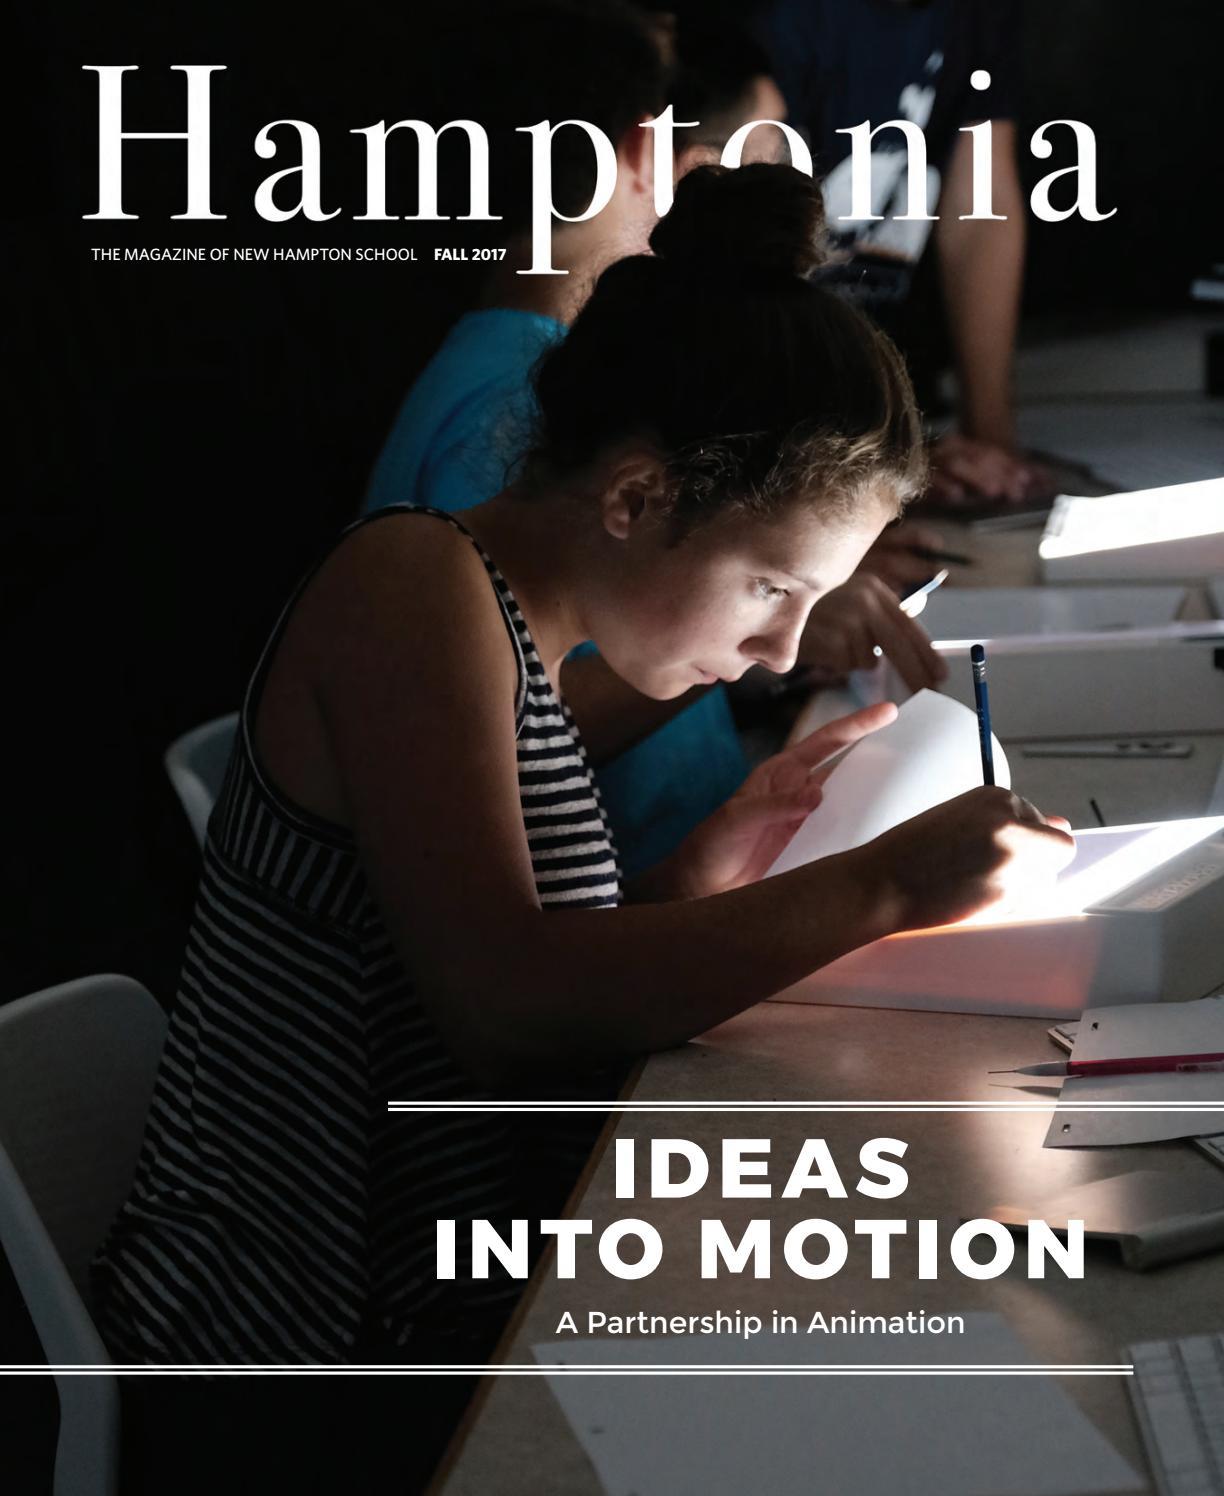 Hamptonia fall 2017 by new hampton school issuu fandeluxe Images